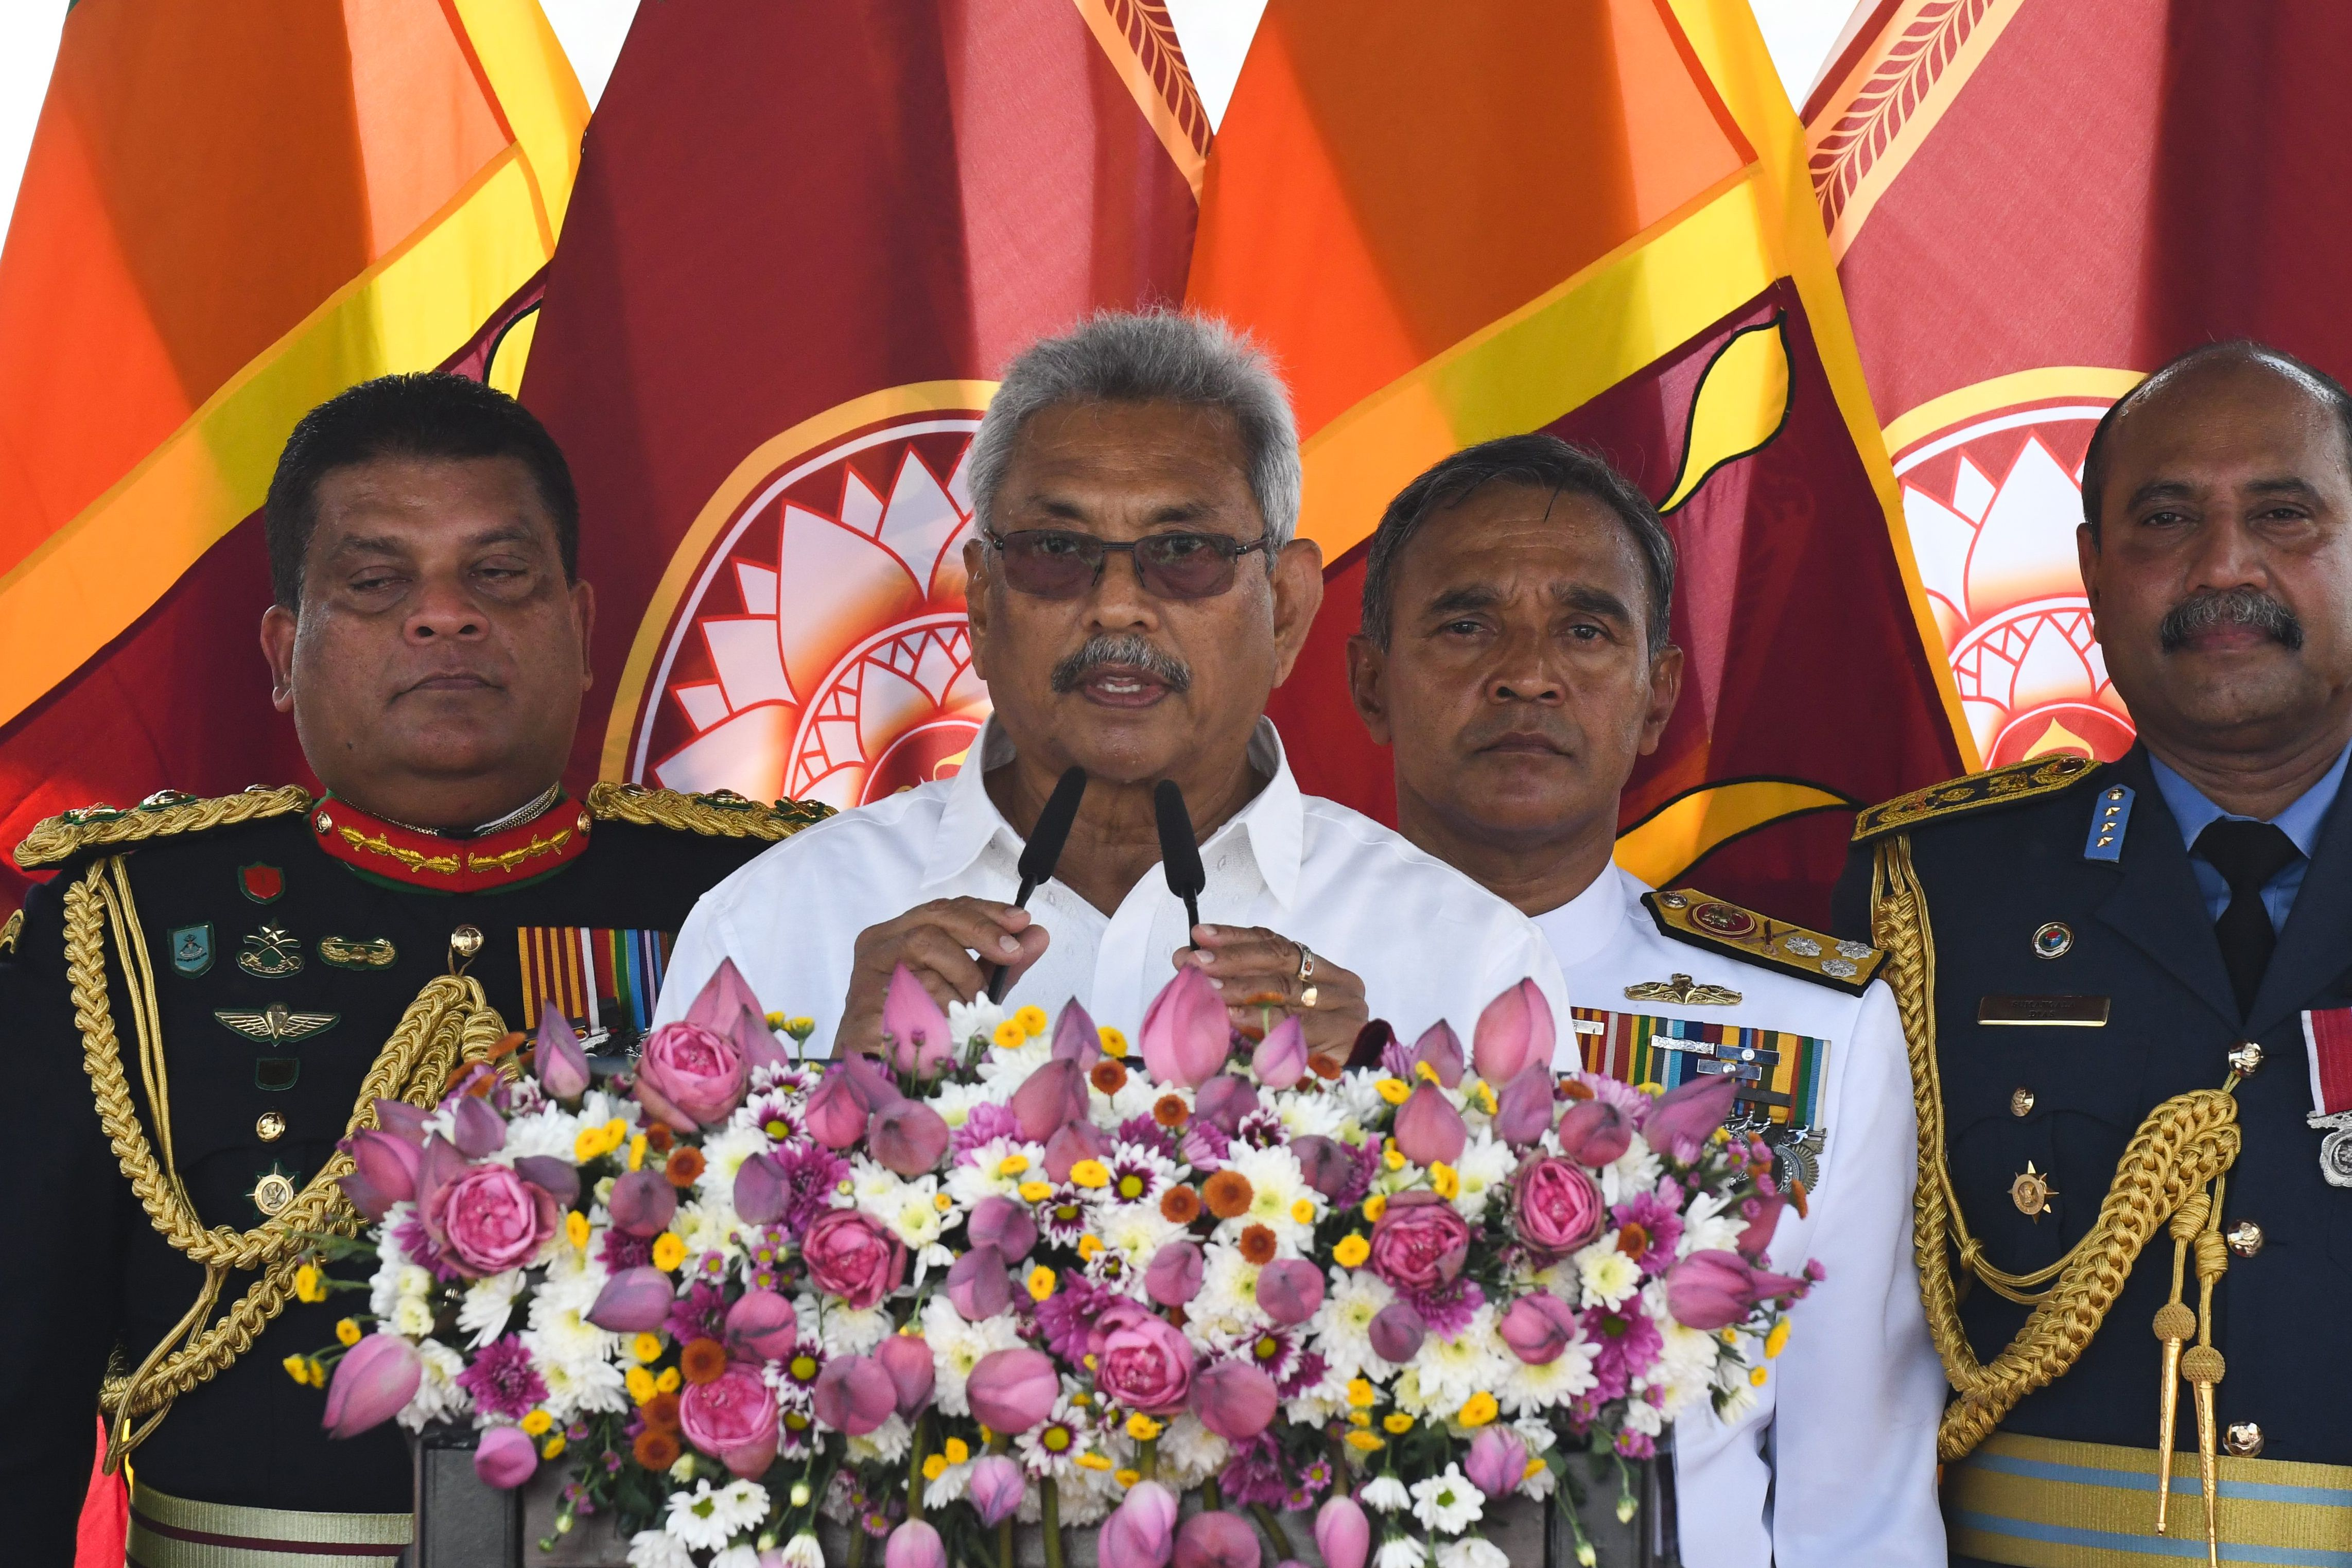 Sri Lanka's president Gotabaya Rajapaksa (C) speaks during his swearing-in ceremony at the Ruwanwelisaya temple in Anuradhapura on November 18, 2019.  (Photo by LAKRUWAN WANNIARACHCHI/AFP via Getty Images)